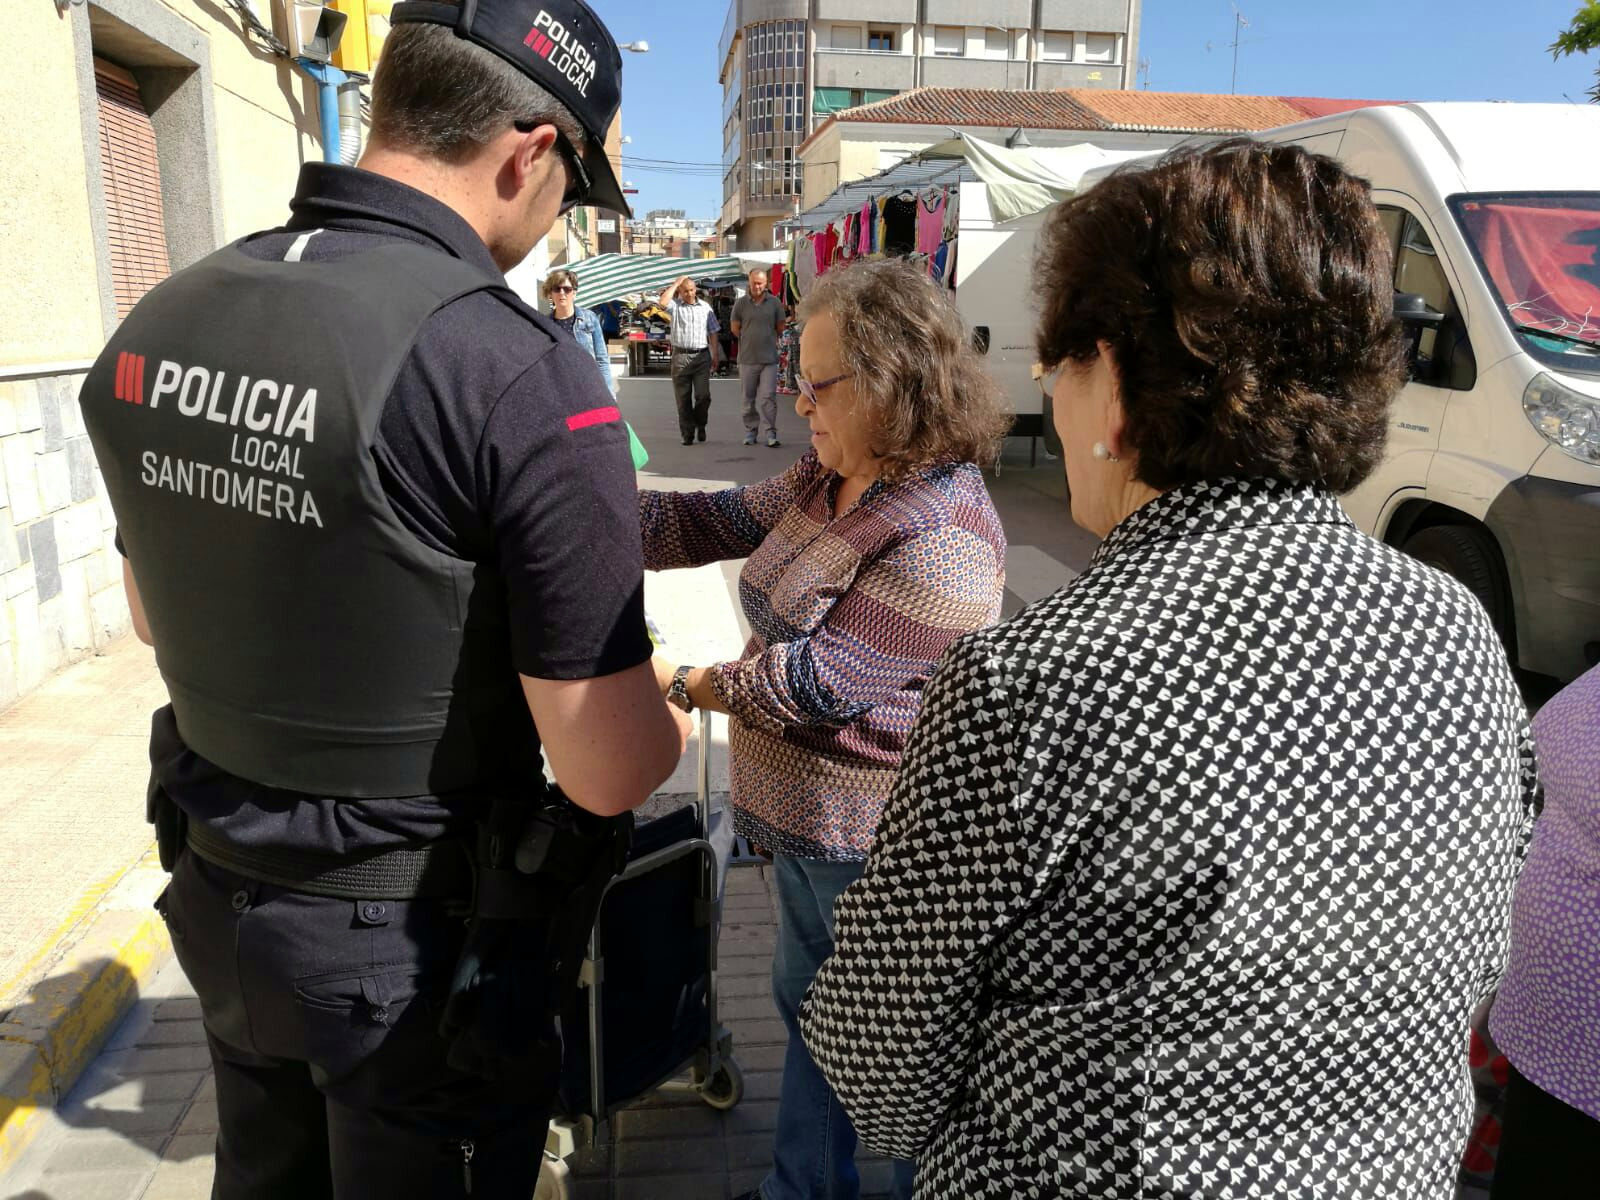 Policia Local campaña peatones